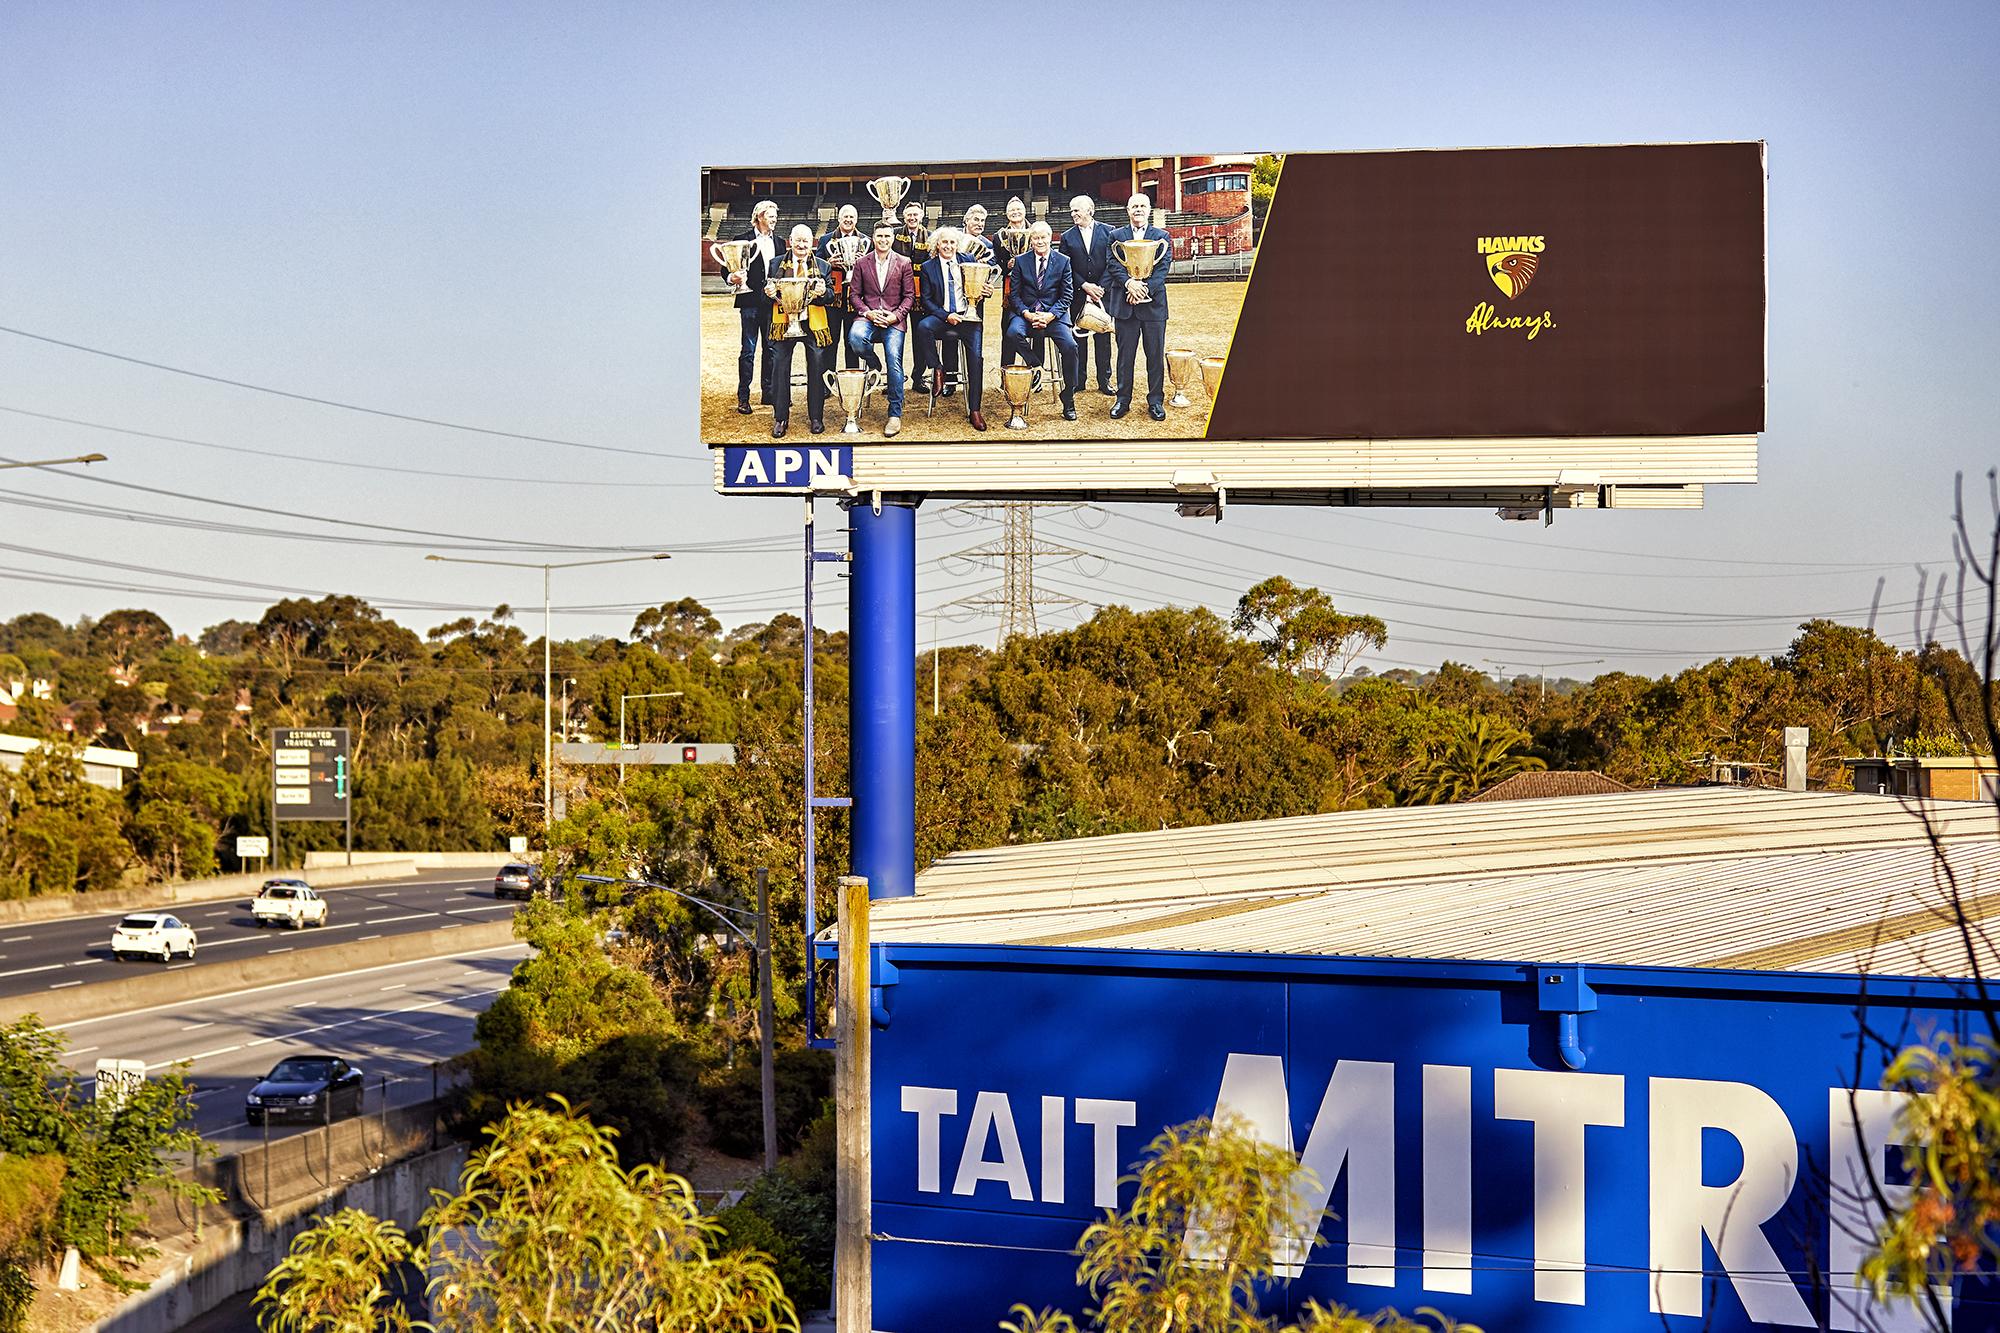 Billboard image for Hawthorn FC